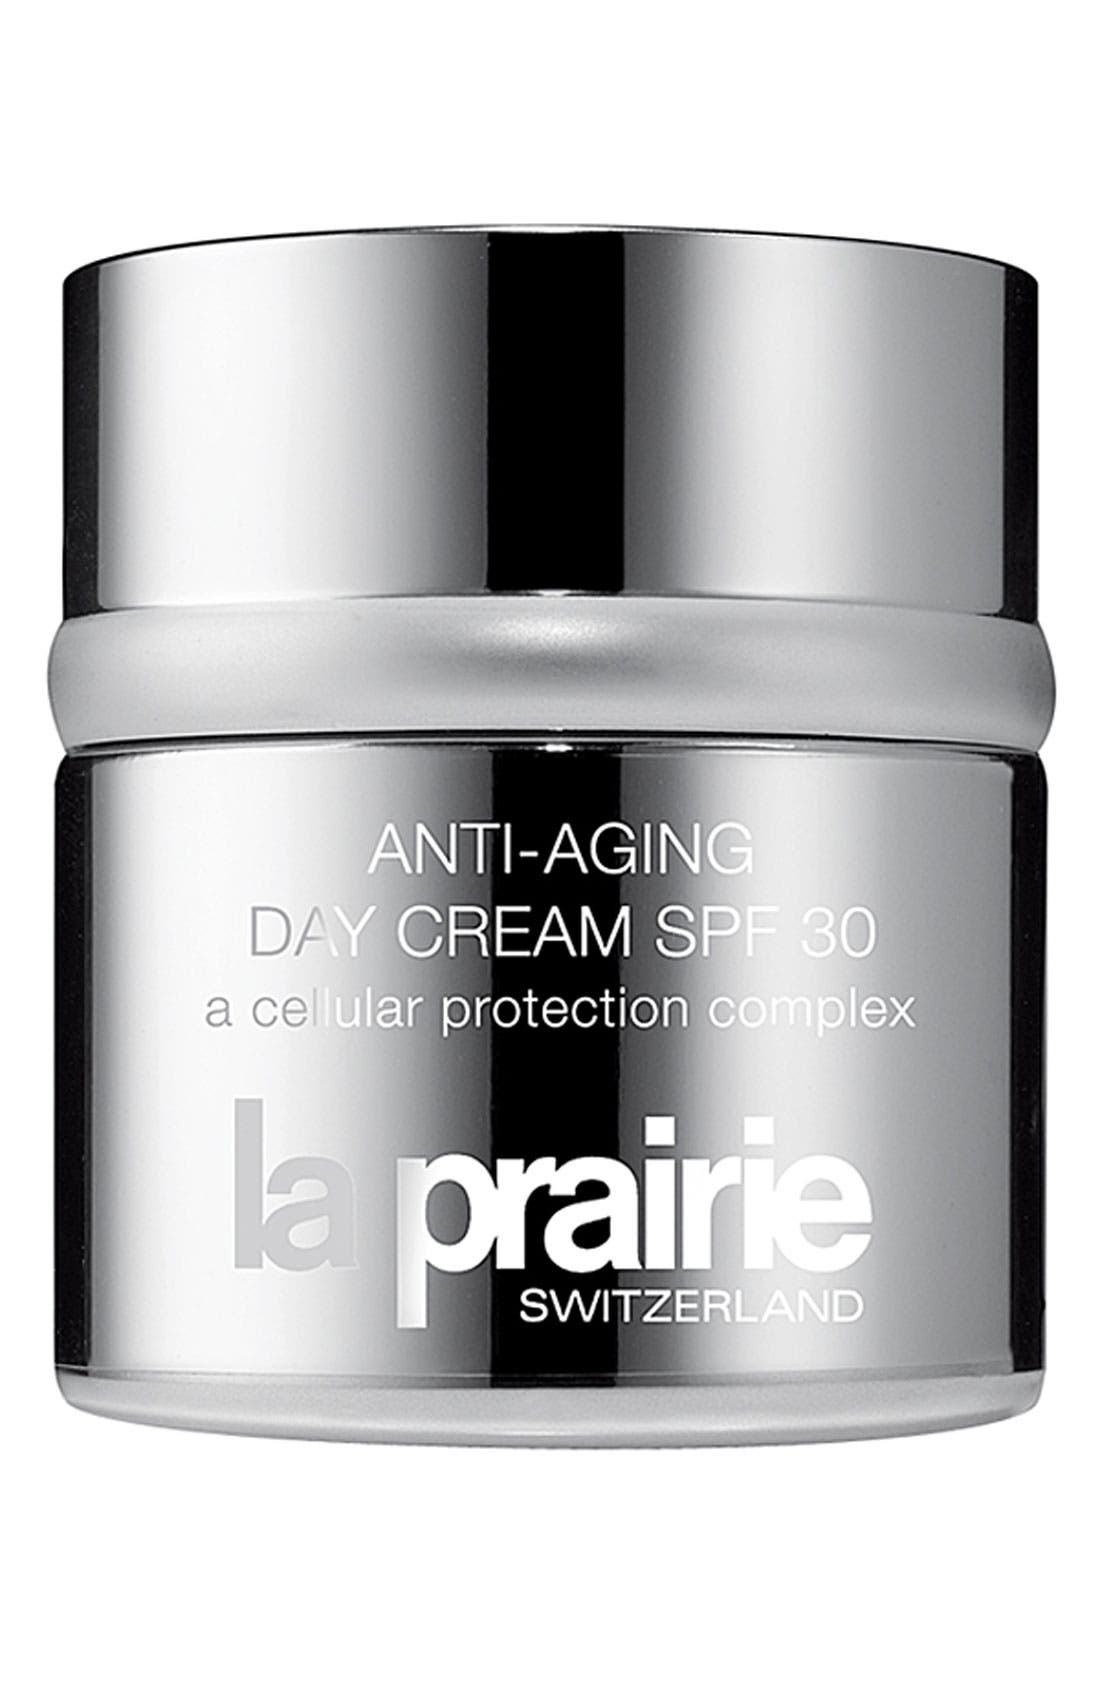 La Prairie Anti-Aging Day Cream Sunscreen Broad Spectrum SPF 30